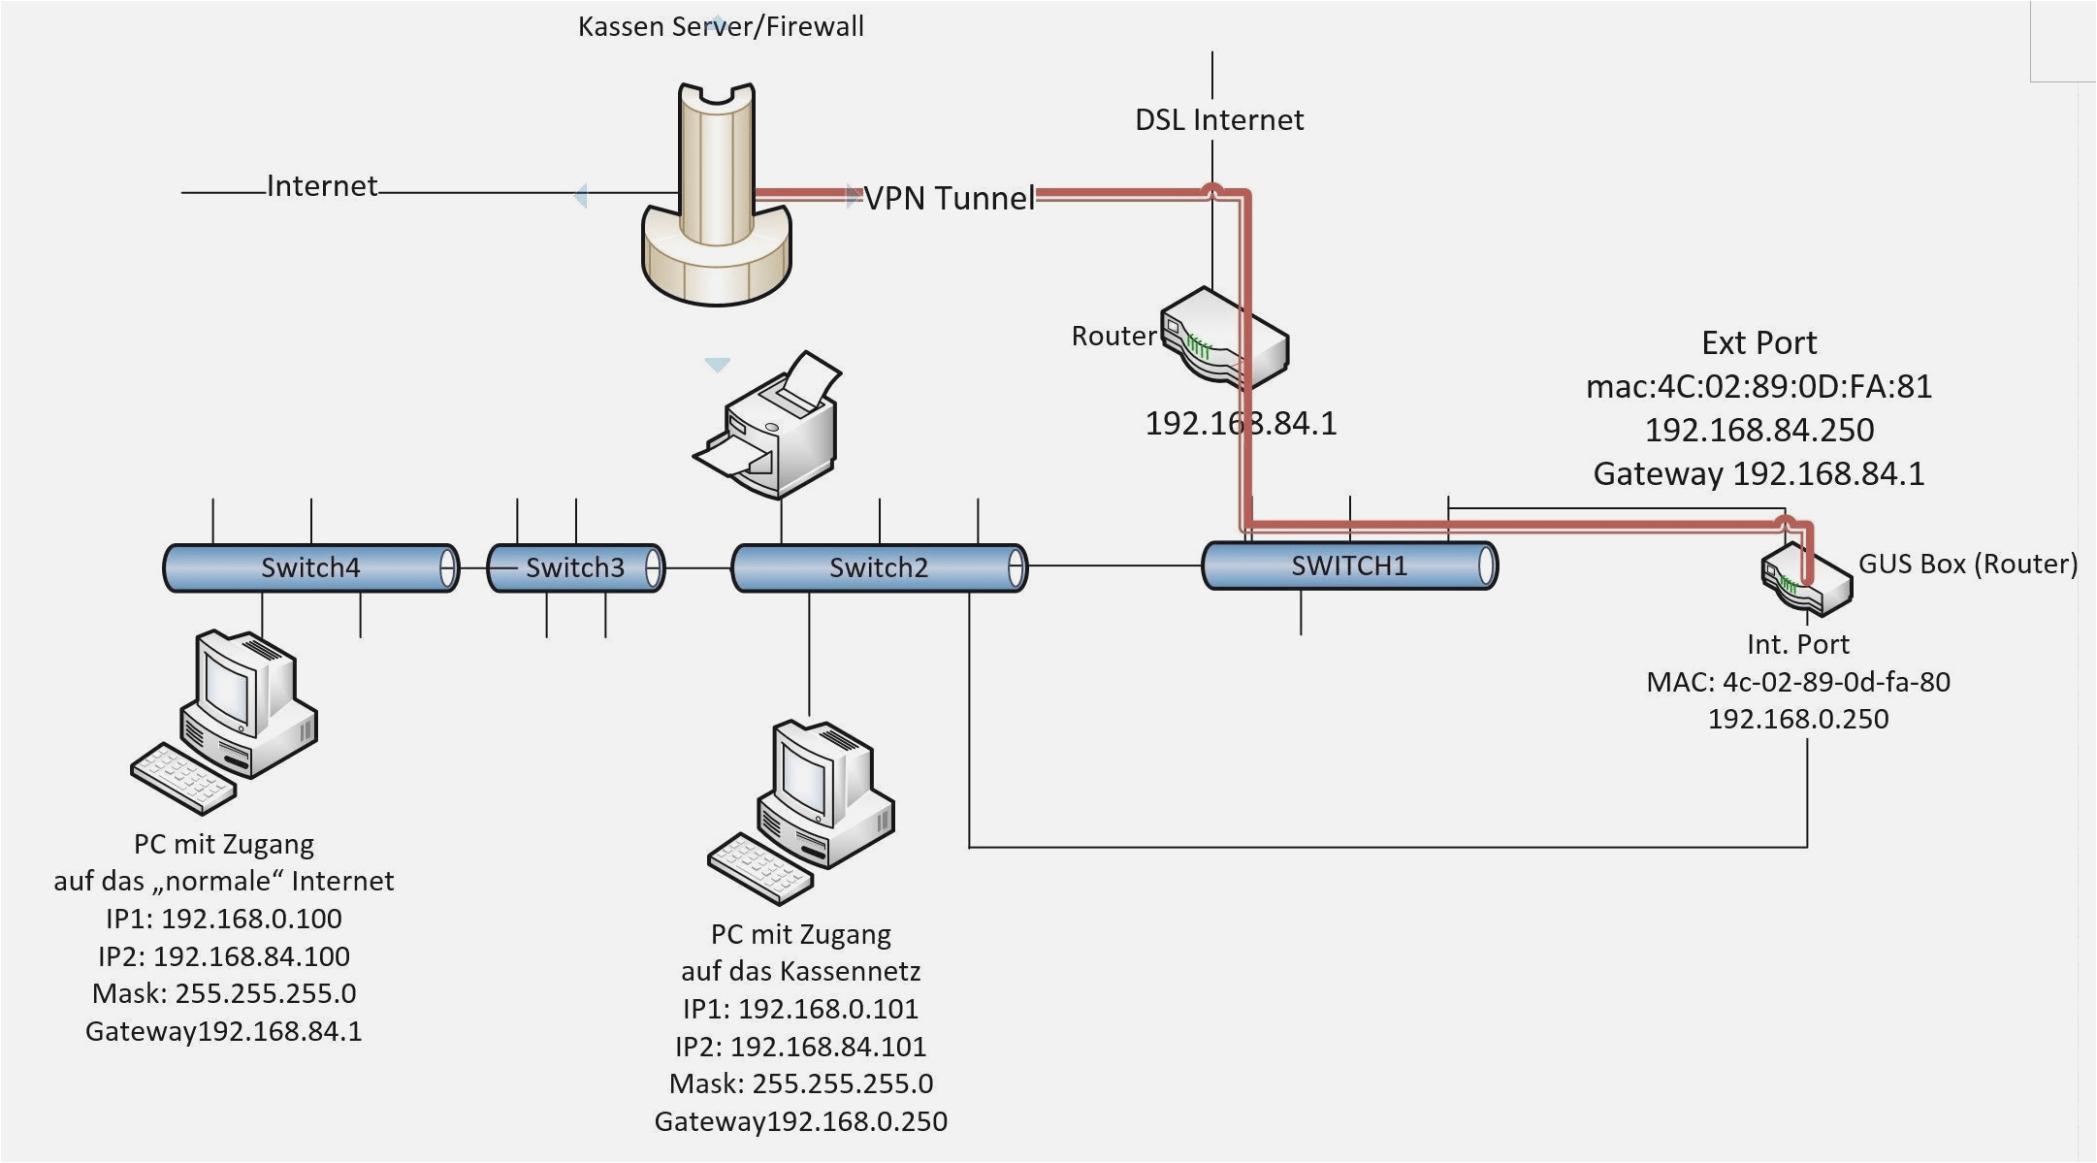 fixture wiring diagram 110v 230v home wiring diagram fixture wiring diagram 110v 230v circuit diagram